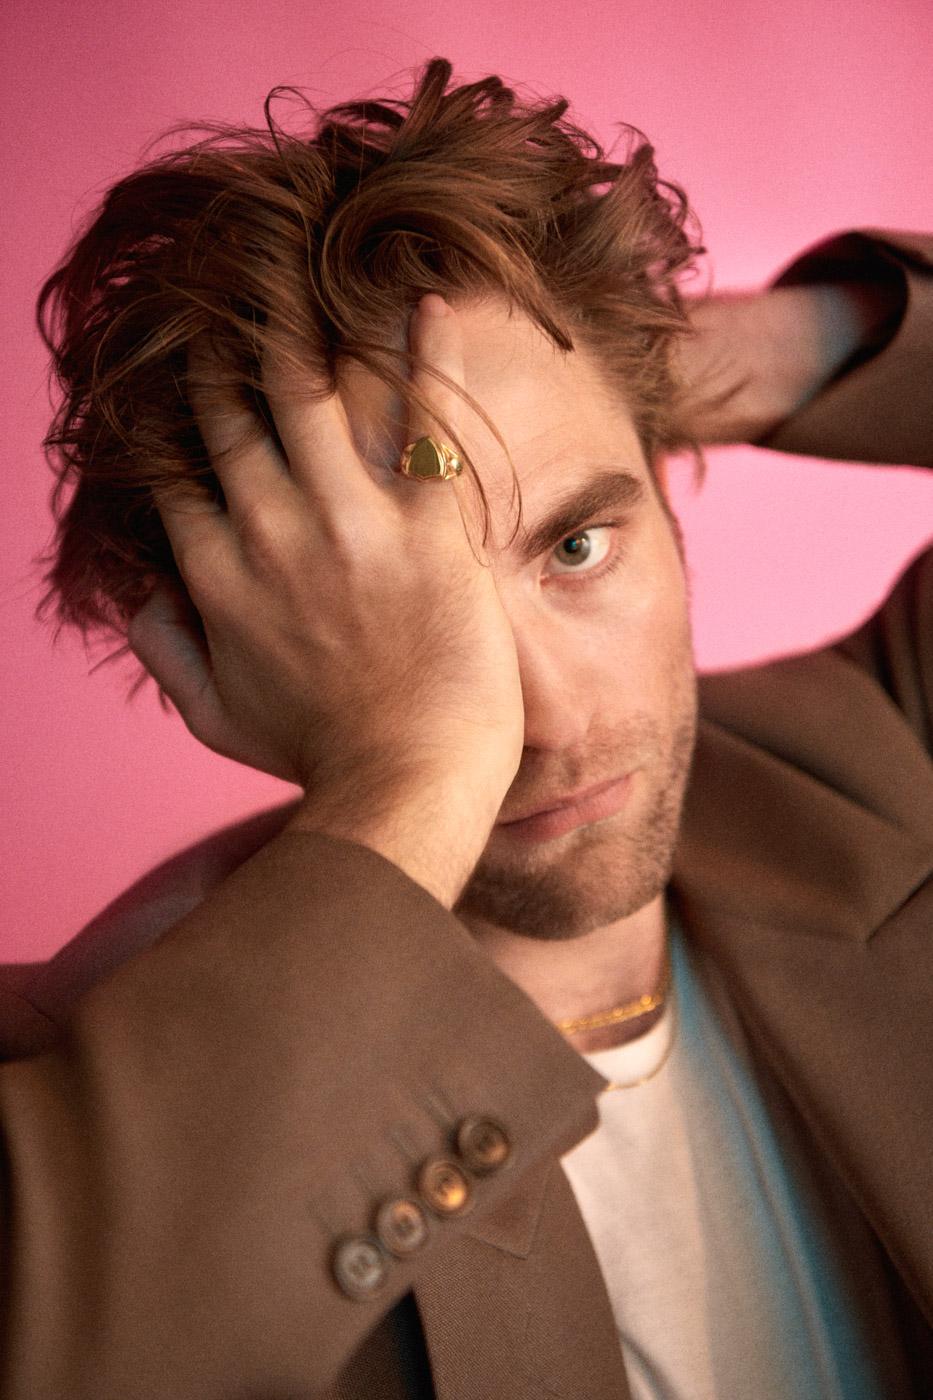 Robert Pattinson, Interview Magazine, Fall Issue, November 2, 2018.